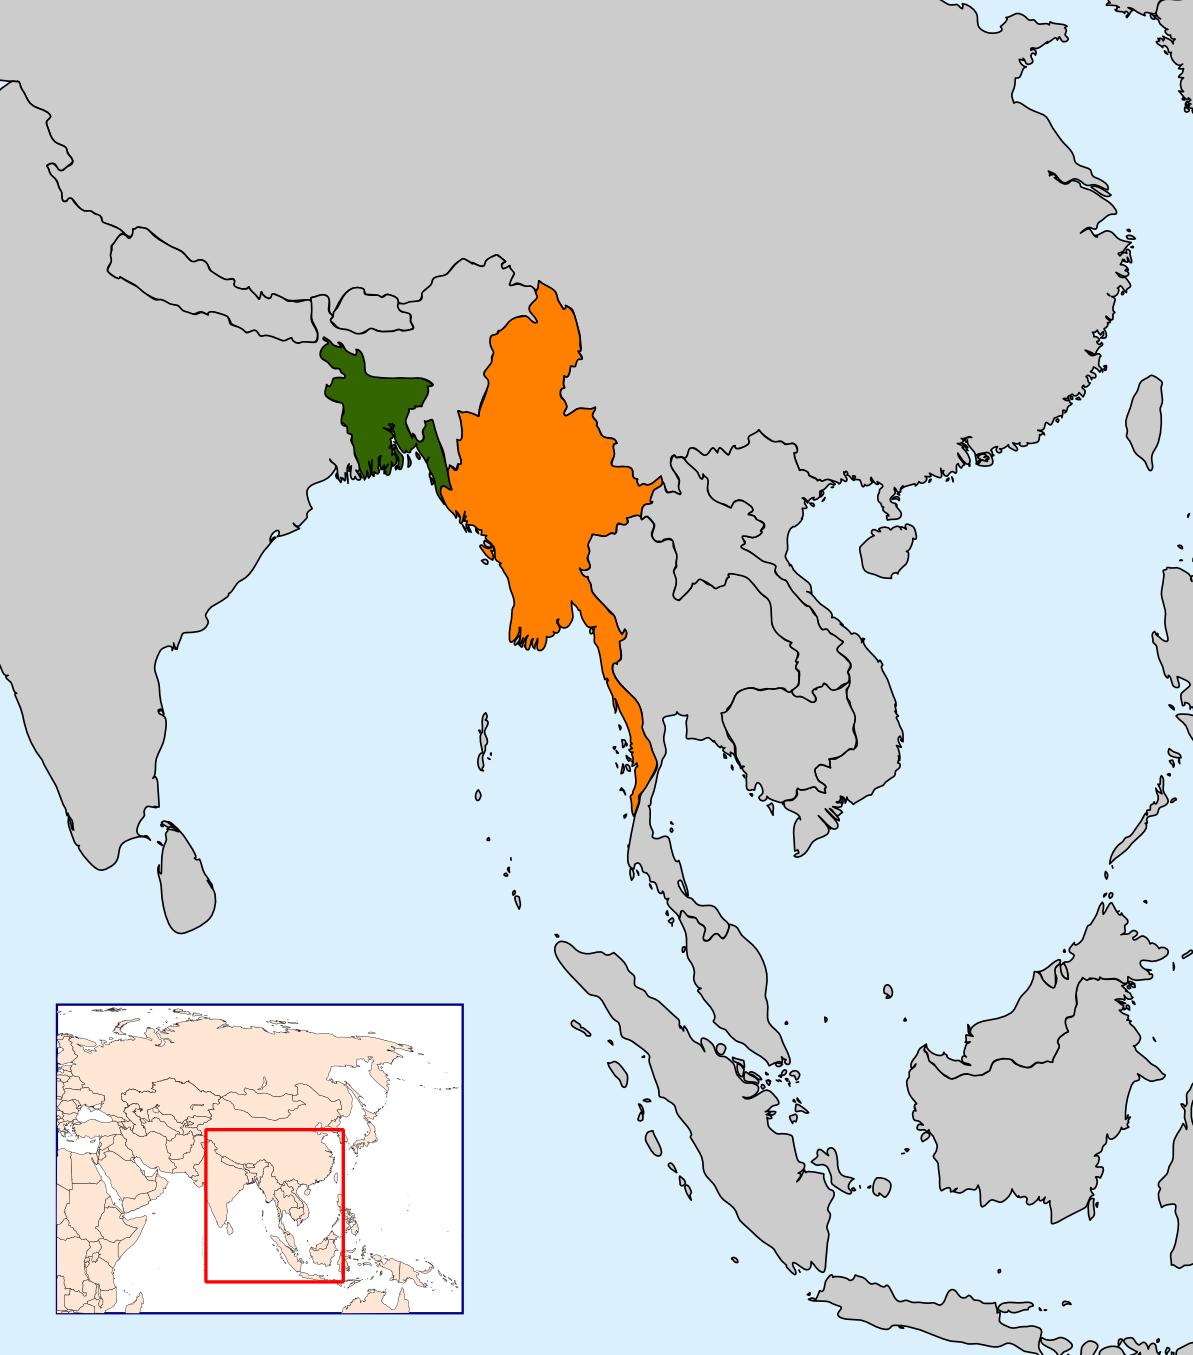 Bangladeshmyanmar relations wikipedia gumiabroncs Choice Image